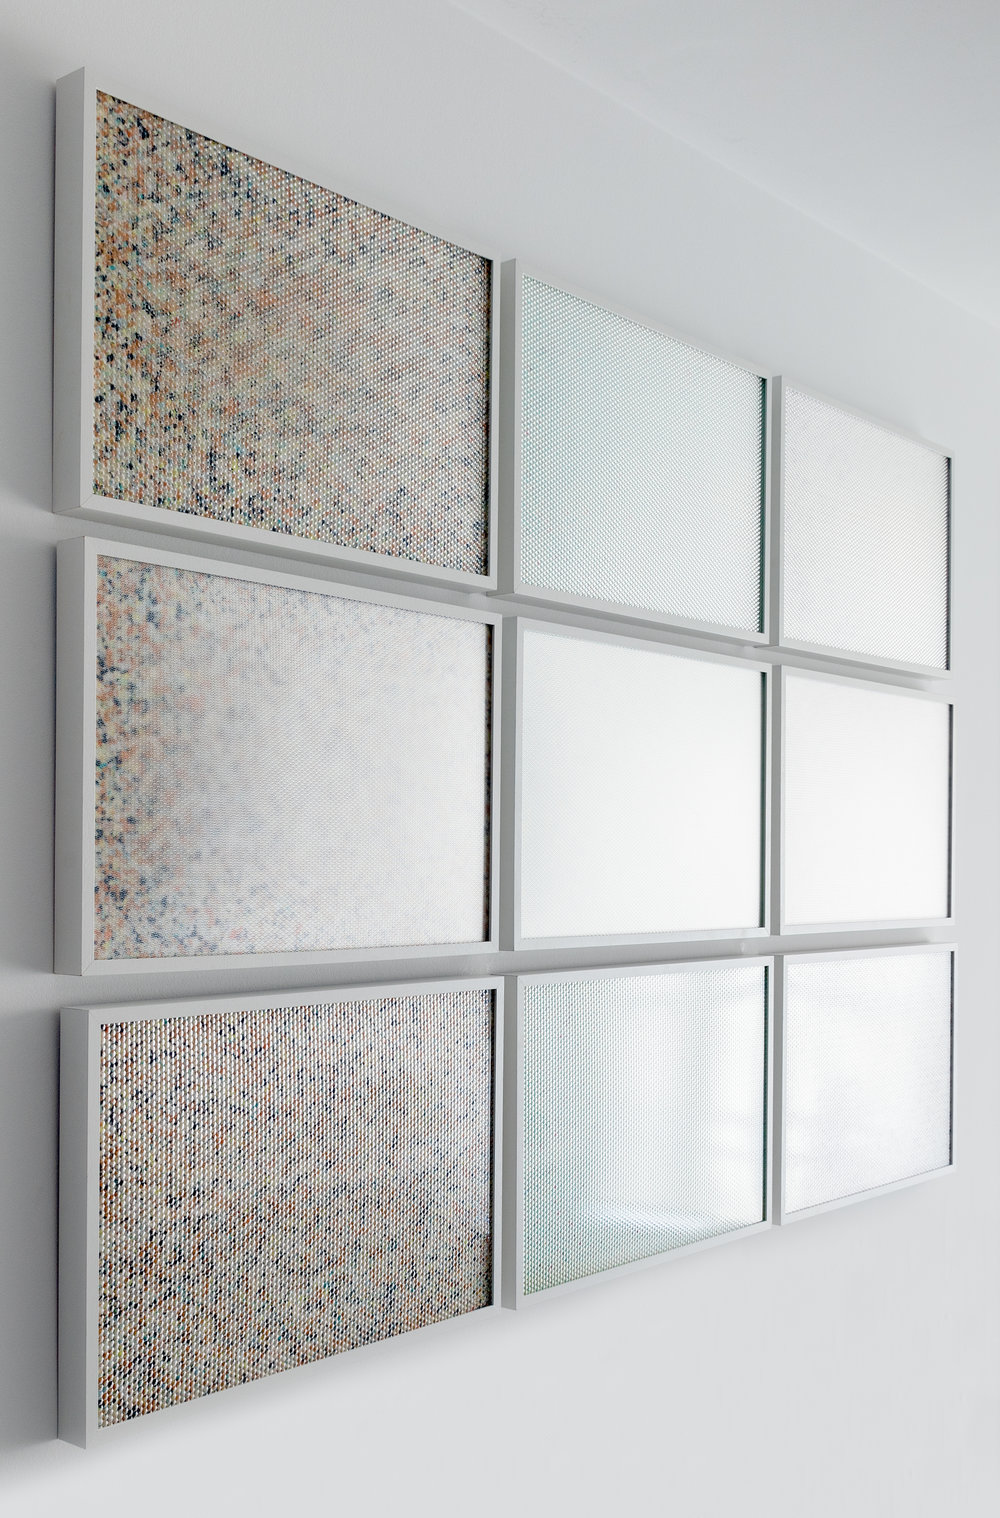 Molecular - Side view (2015) 9 panel grid, painted insulation foam beneath structured Plexiglas. 190 x 130 cm (75 x 51 in.)